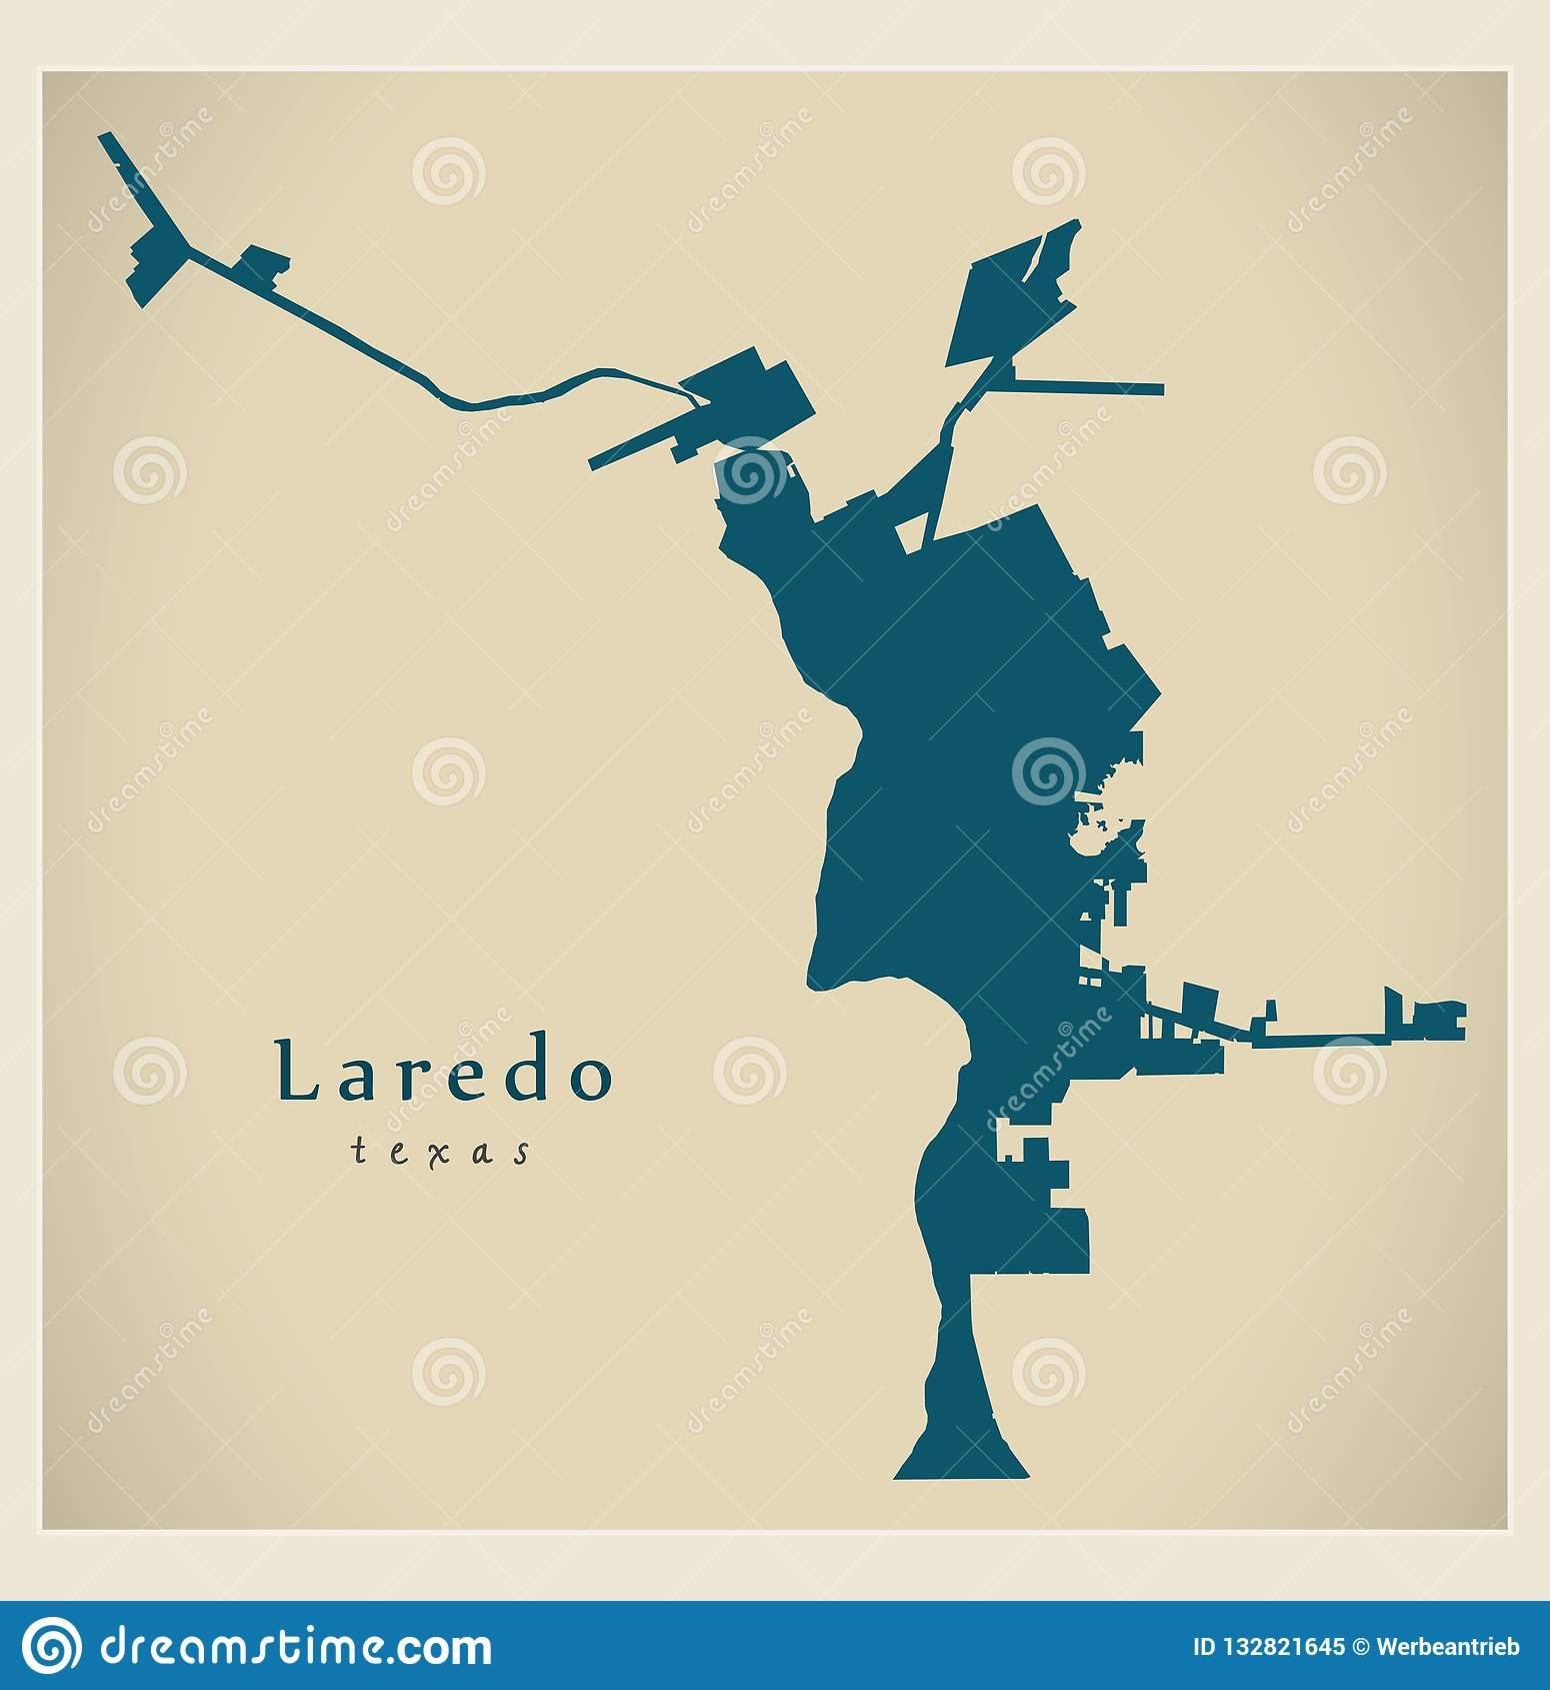 Map Of Texas Showing Laredo.Modern City Map Laredo Texas City Of The Usa Stock Vector